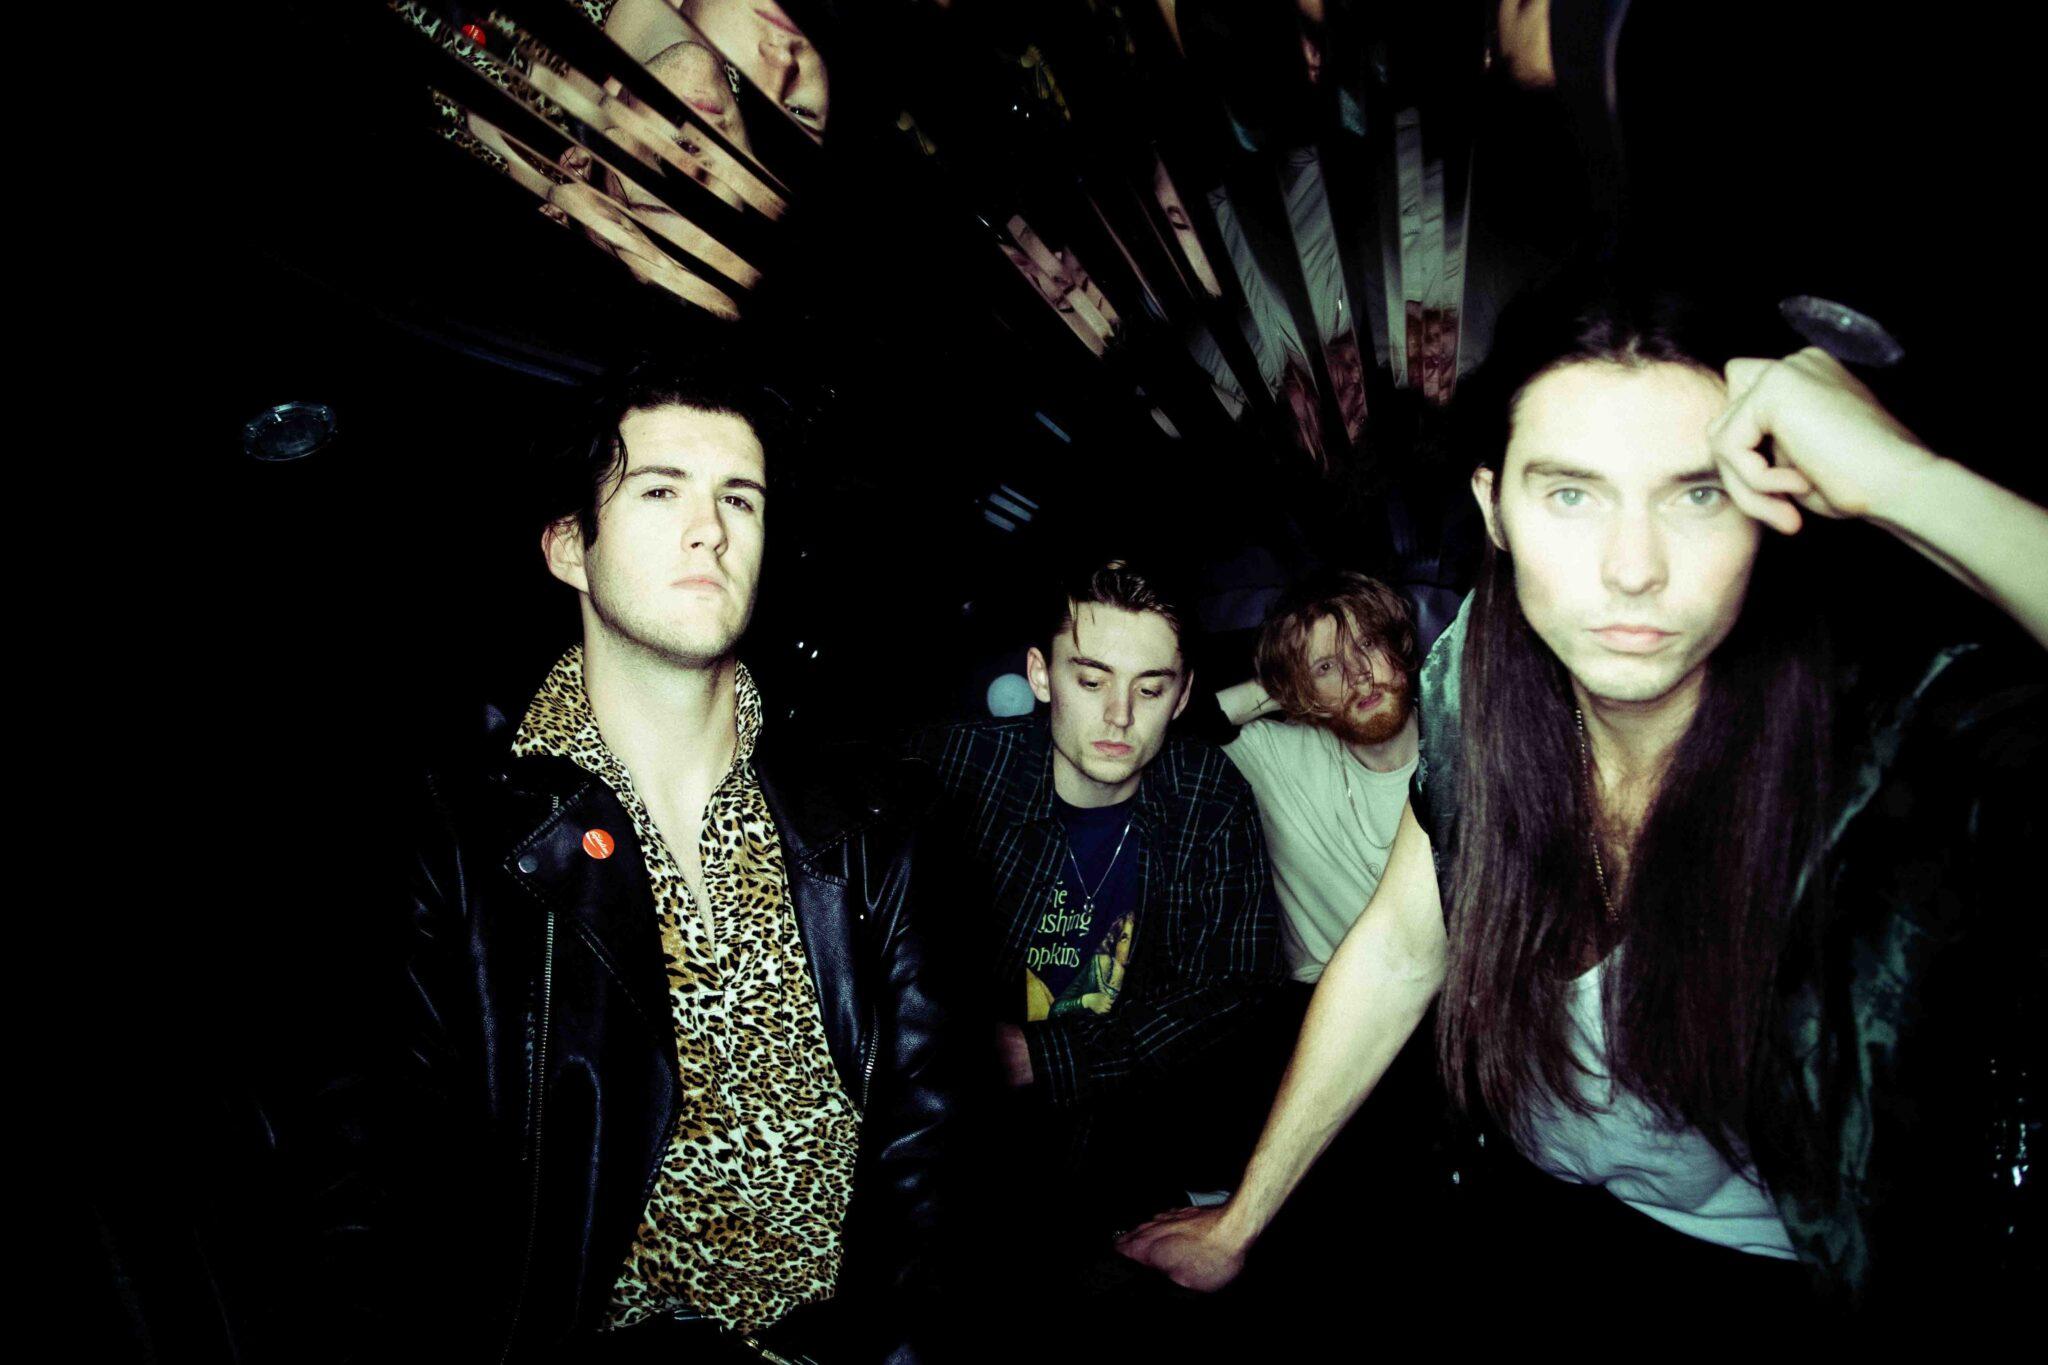 James and The Cold Gun band photo